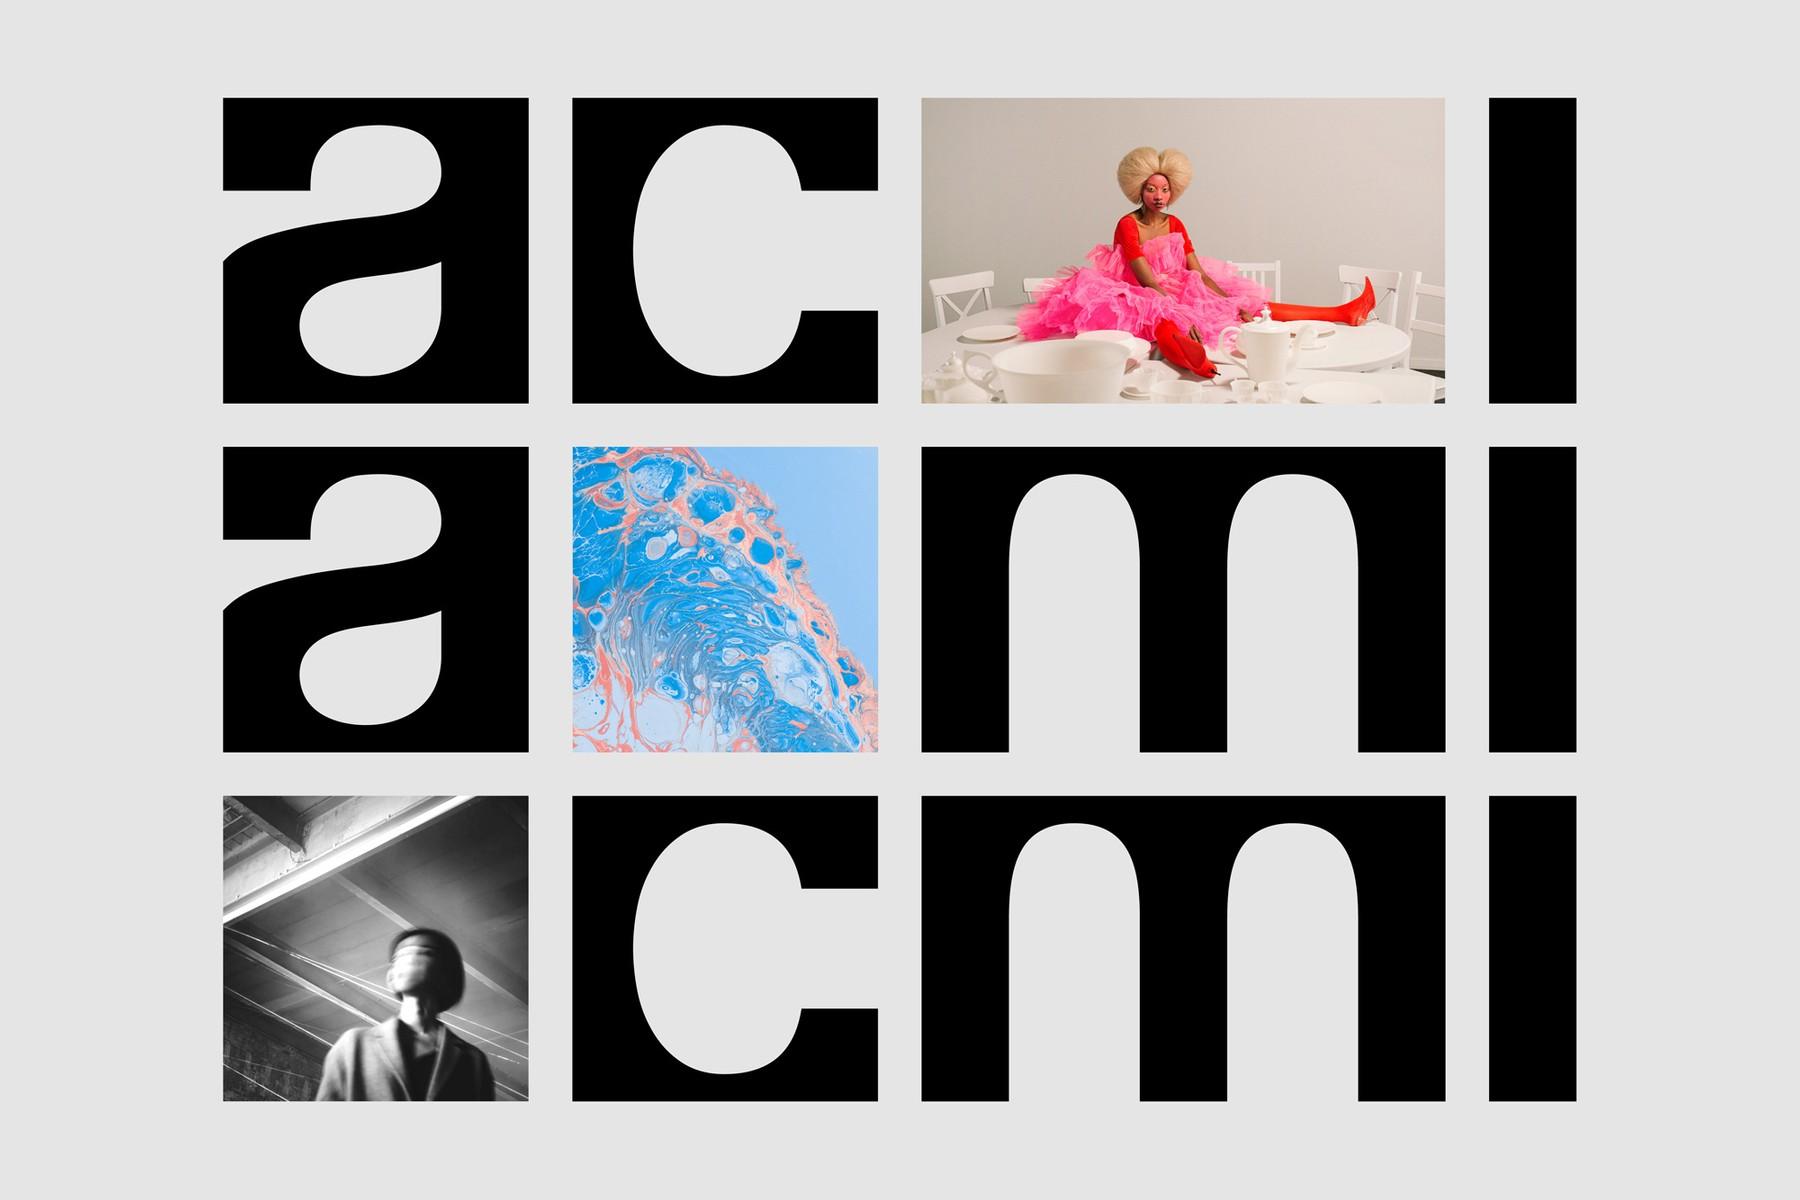 acmi_logo_with_imagery.jpg